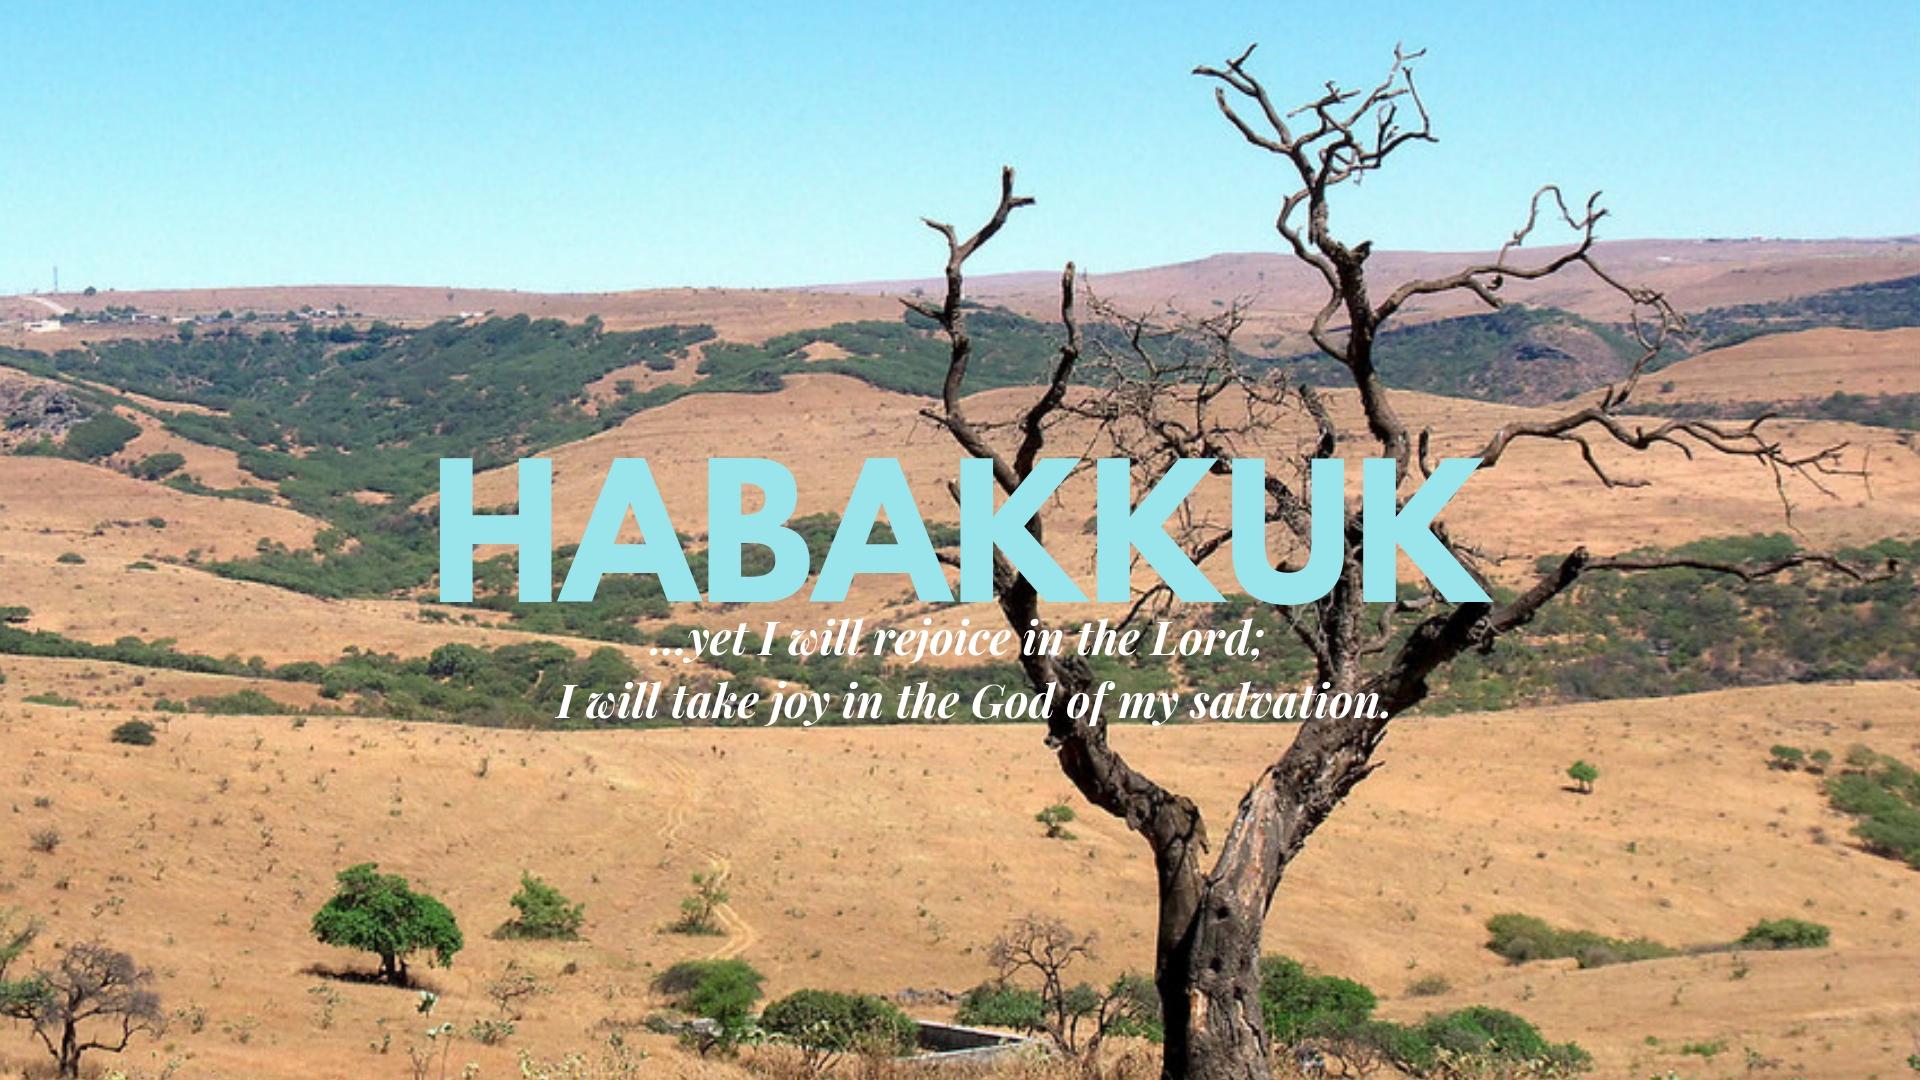 habakkuk large.jpg